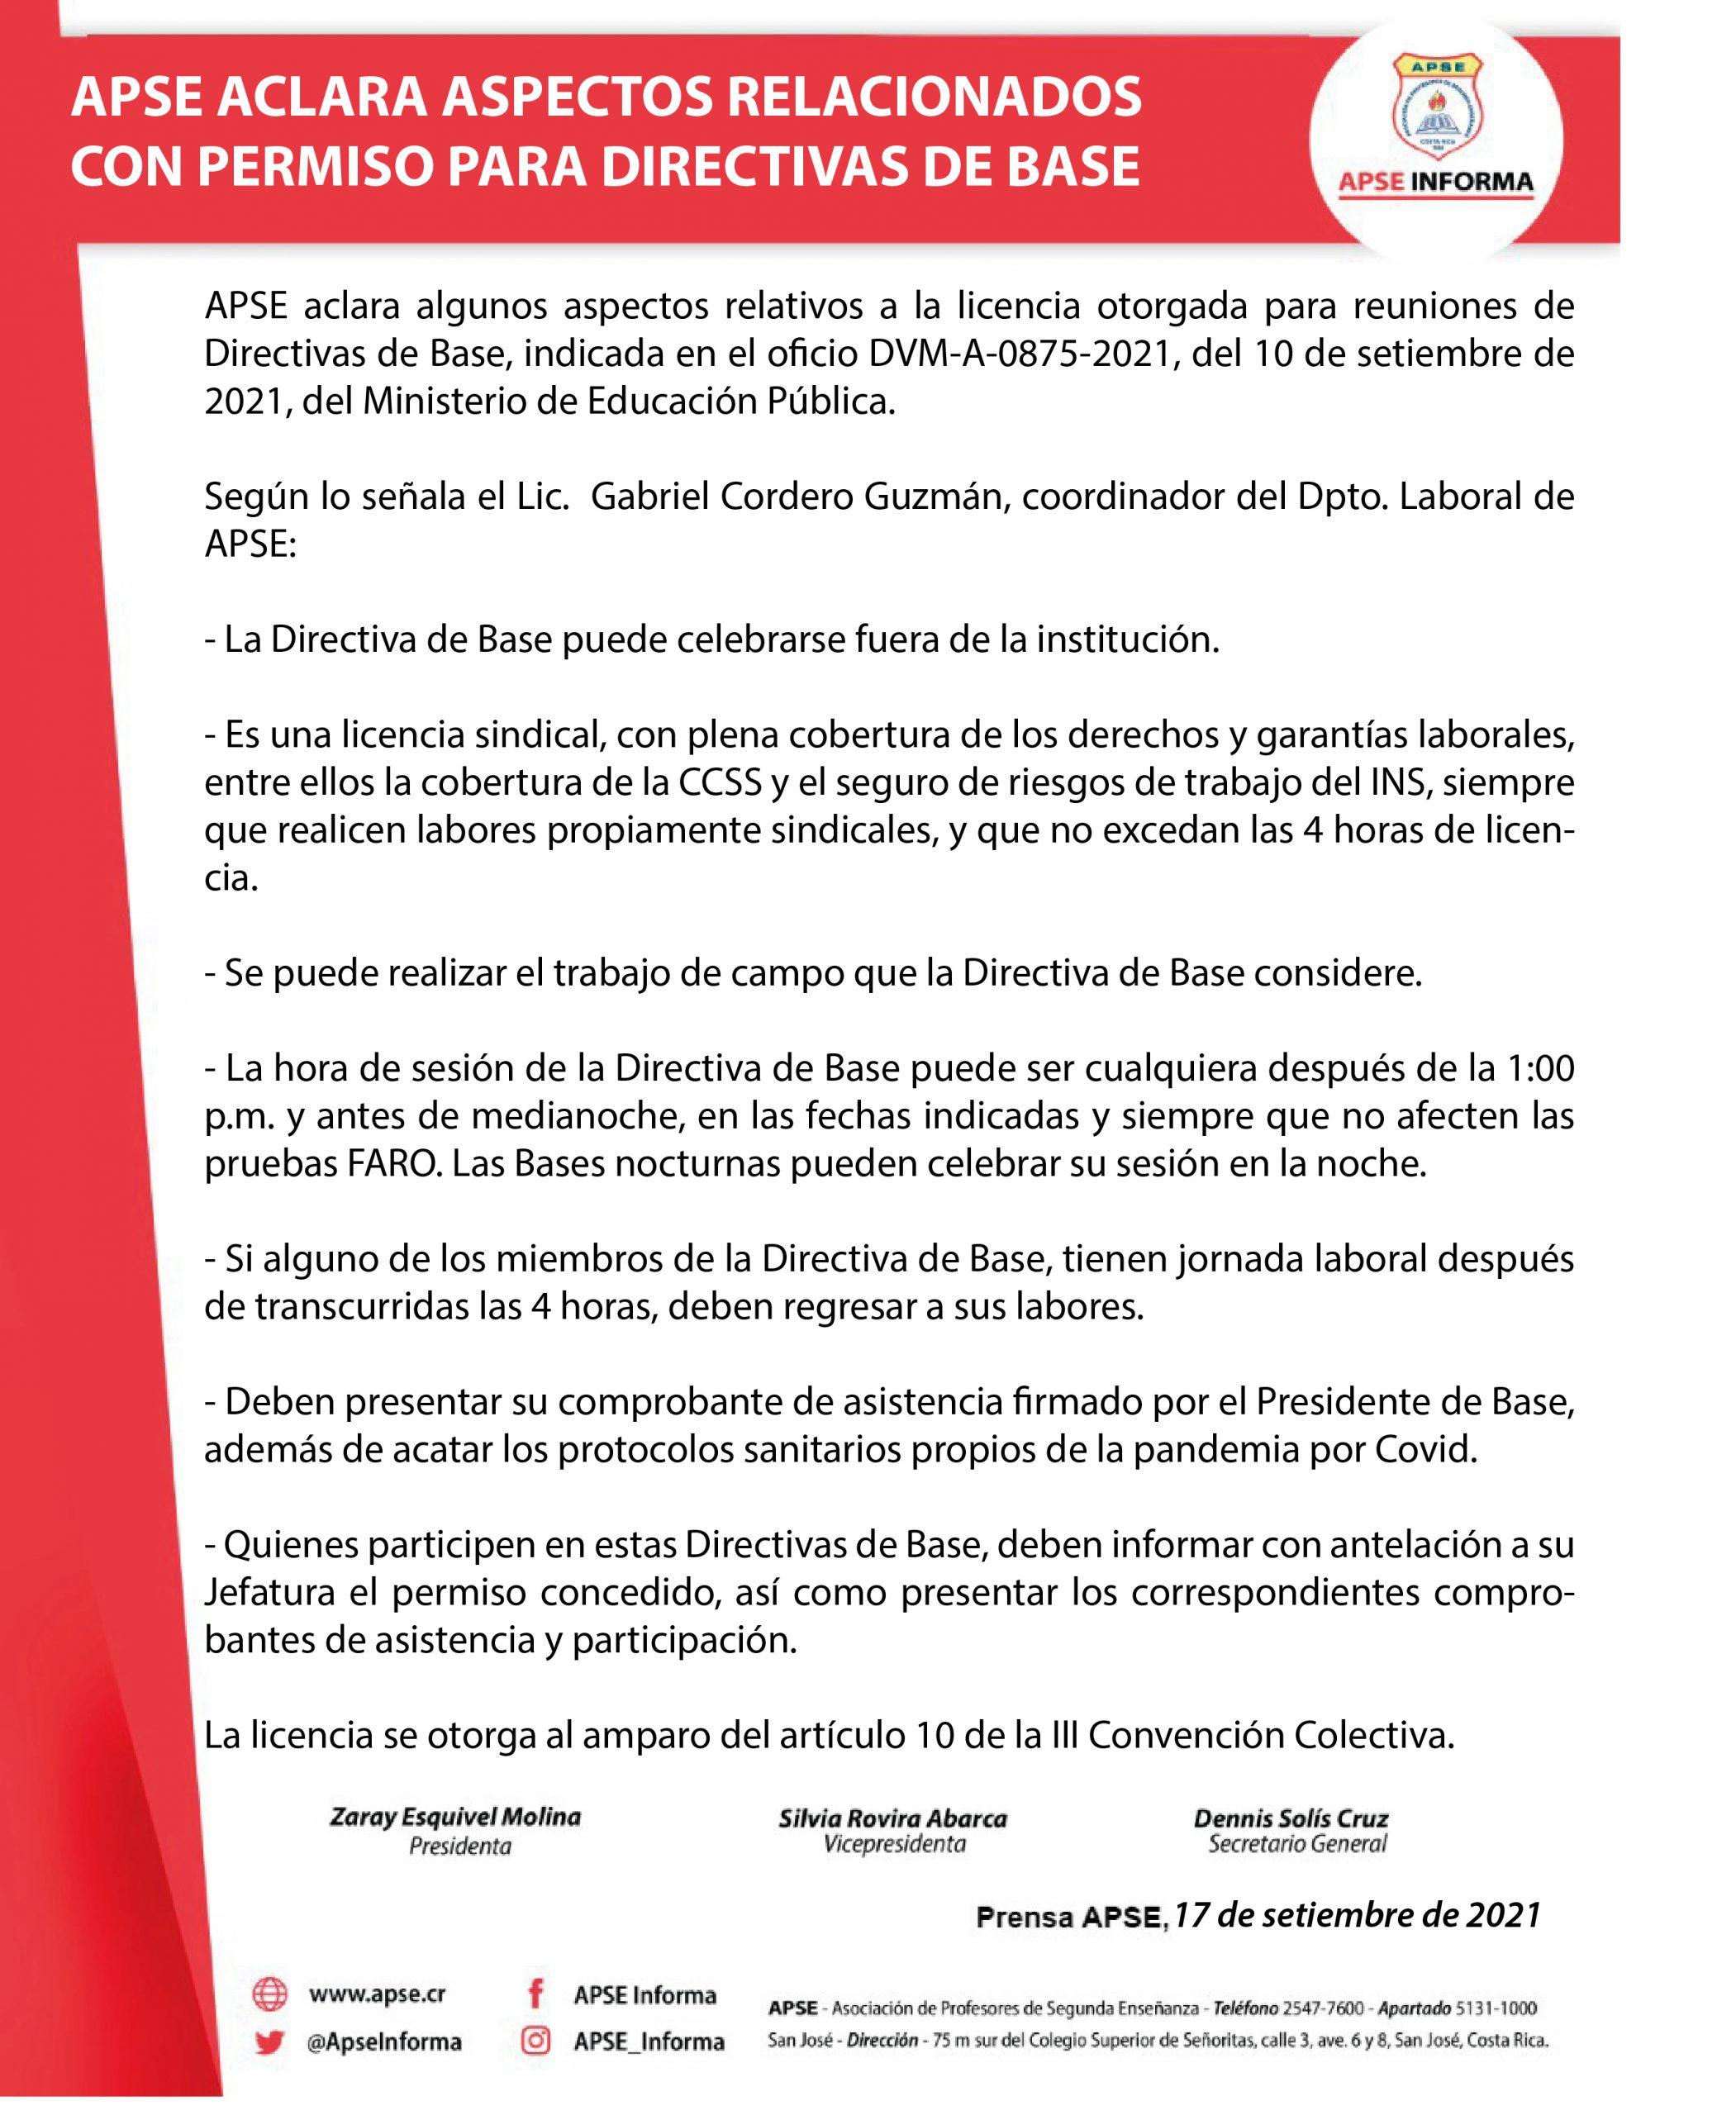 APSE ACLARA ASPECTOS RELACIONADOS CON PERMISO PARA DIRECTIVAS DE BASE